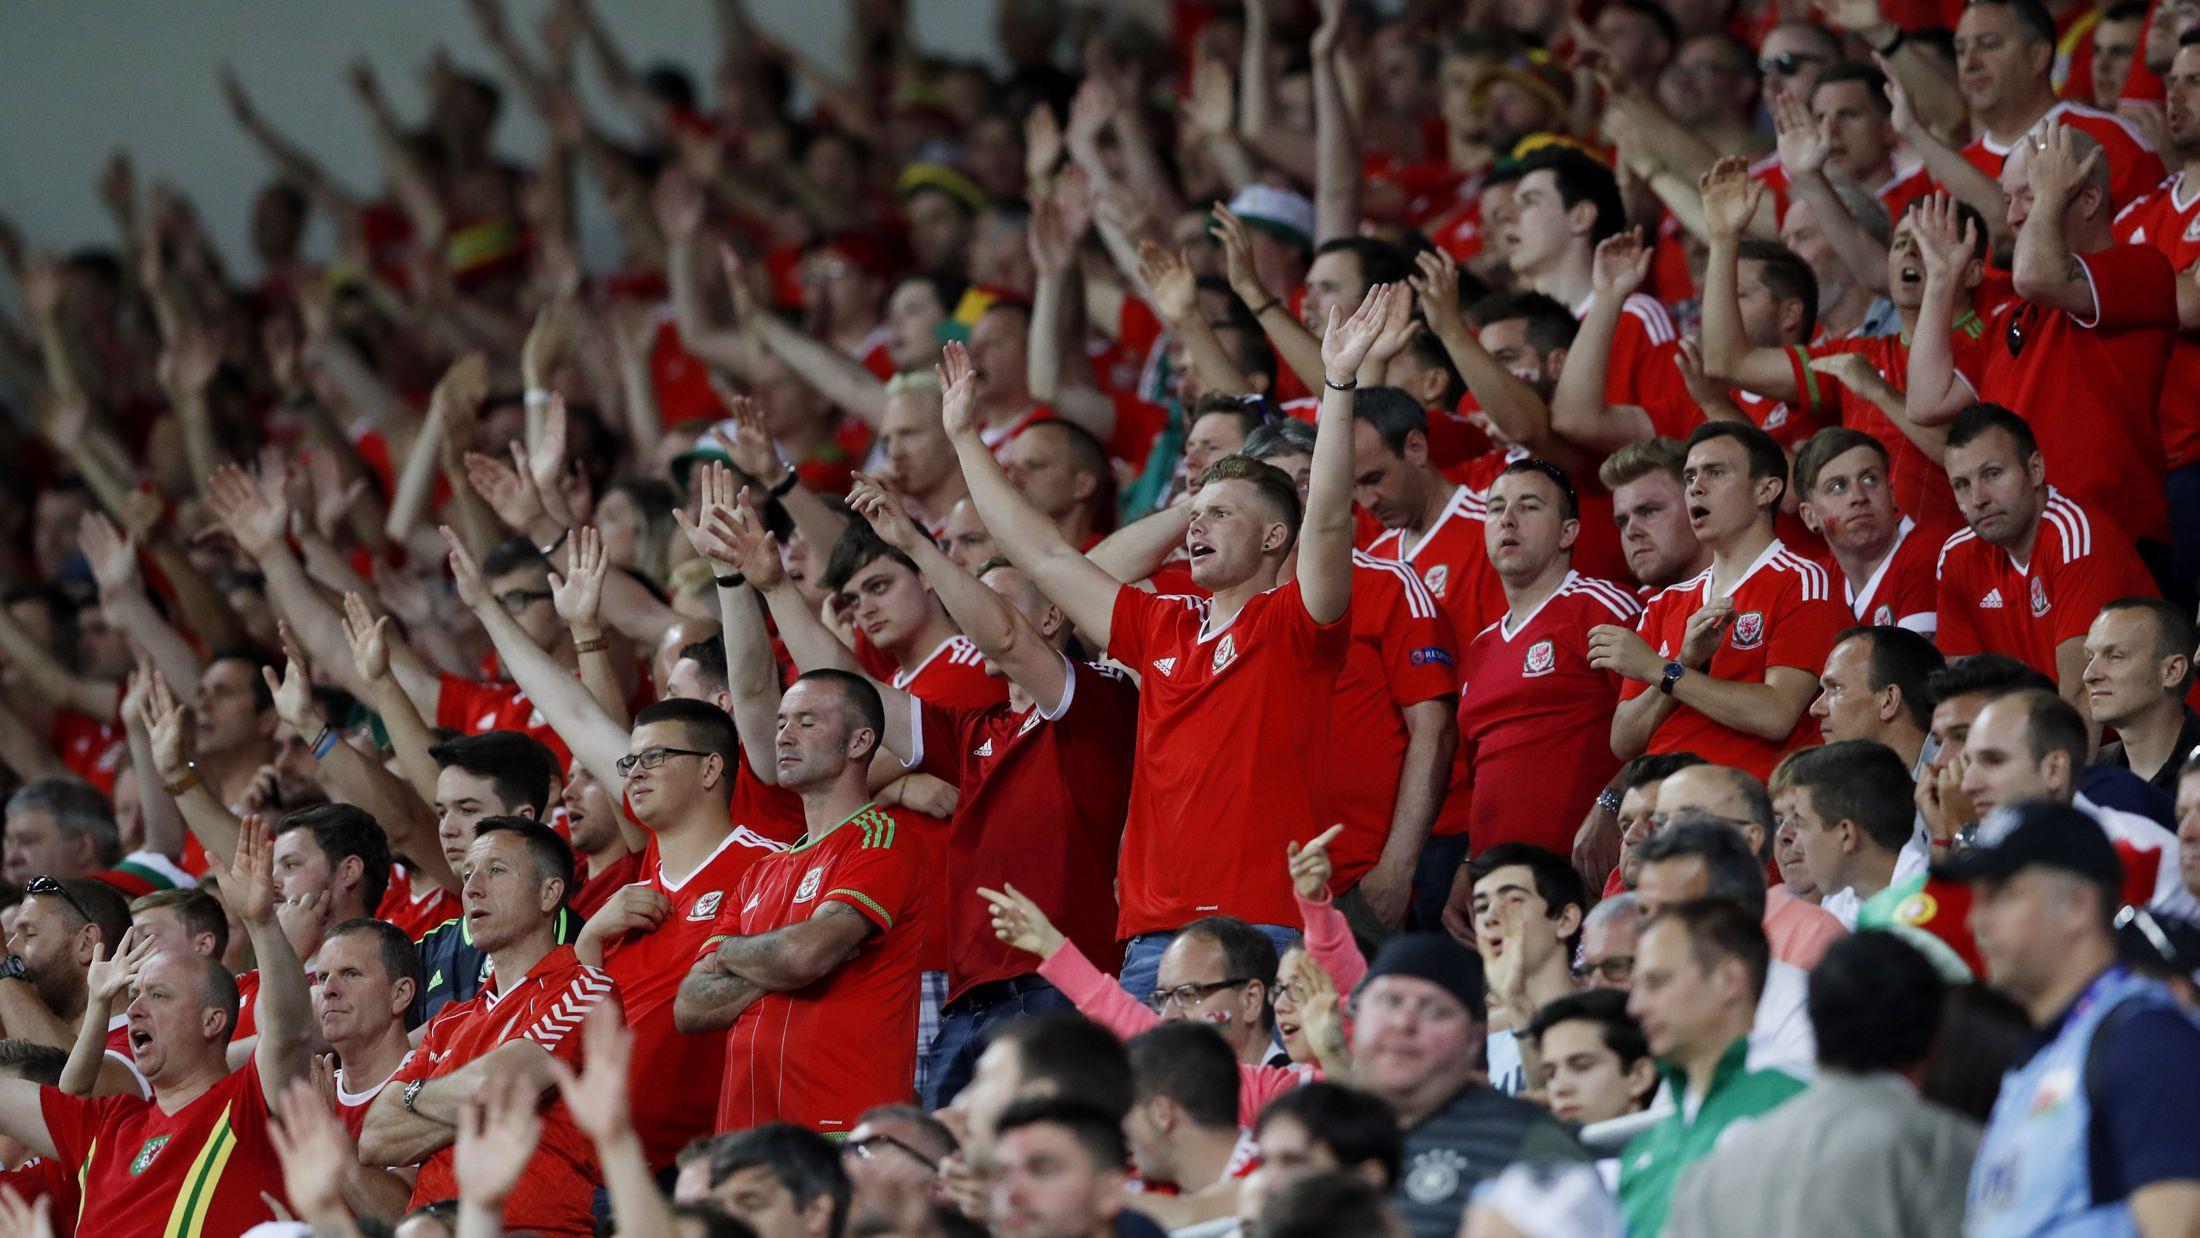 Football Soccer - Portugal v Wales - EURO 2016 - Semi Final - Stade de Lyon, Lyon, France - 6/7/16 Wales fans